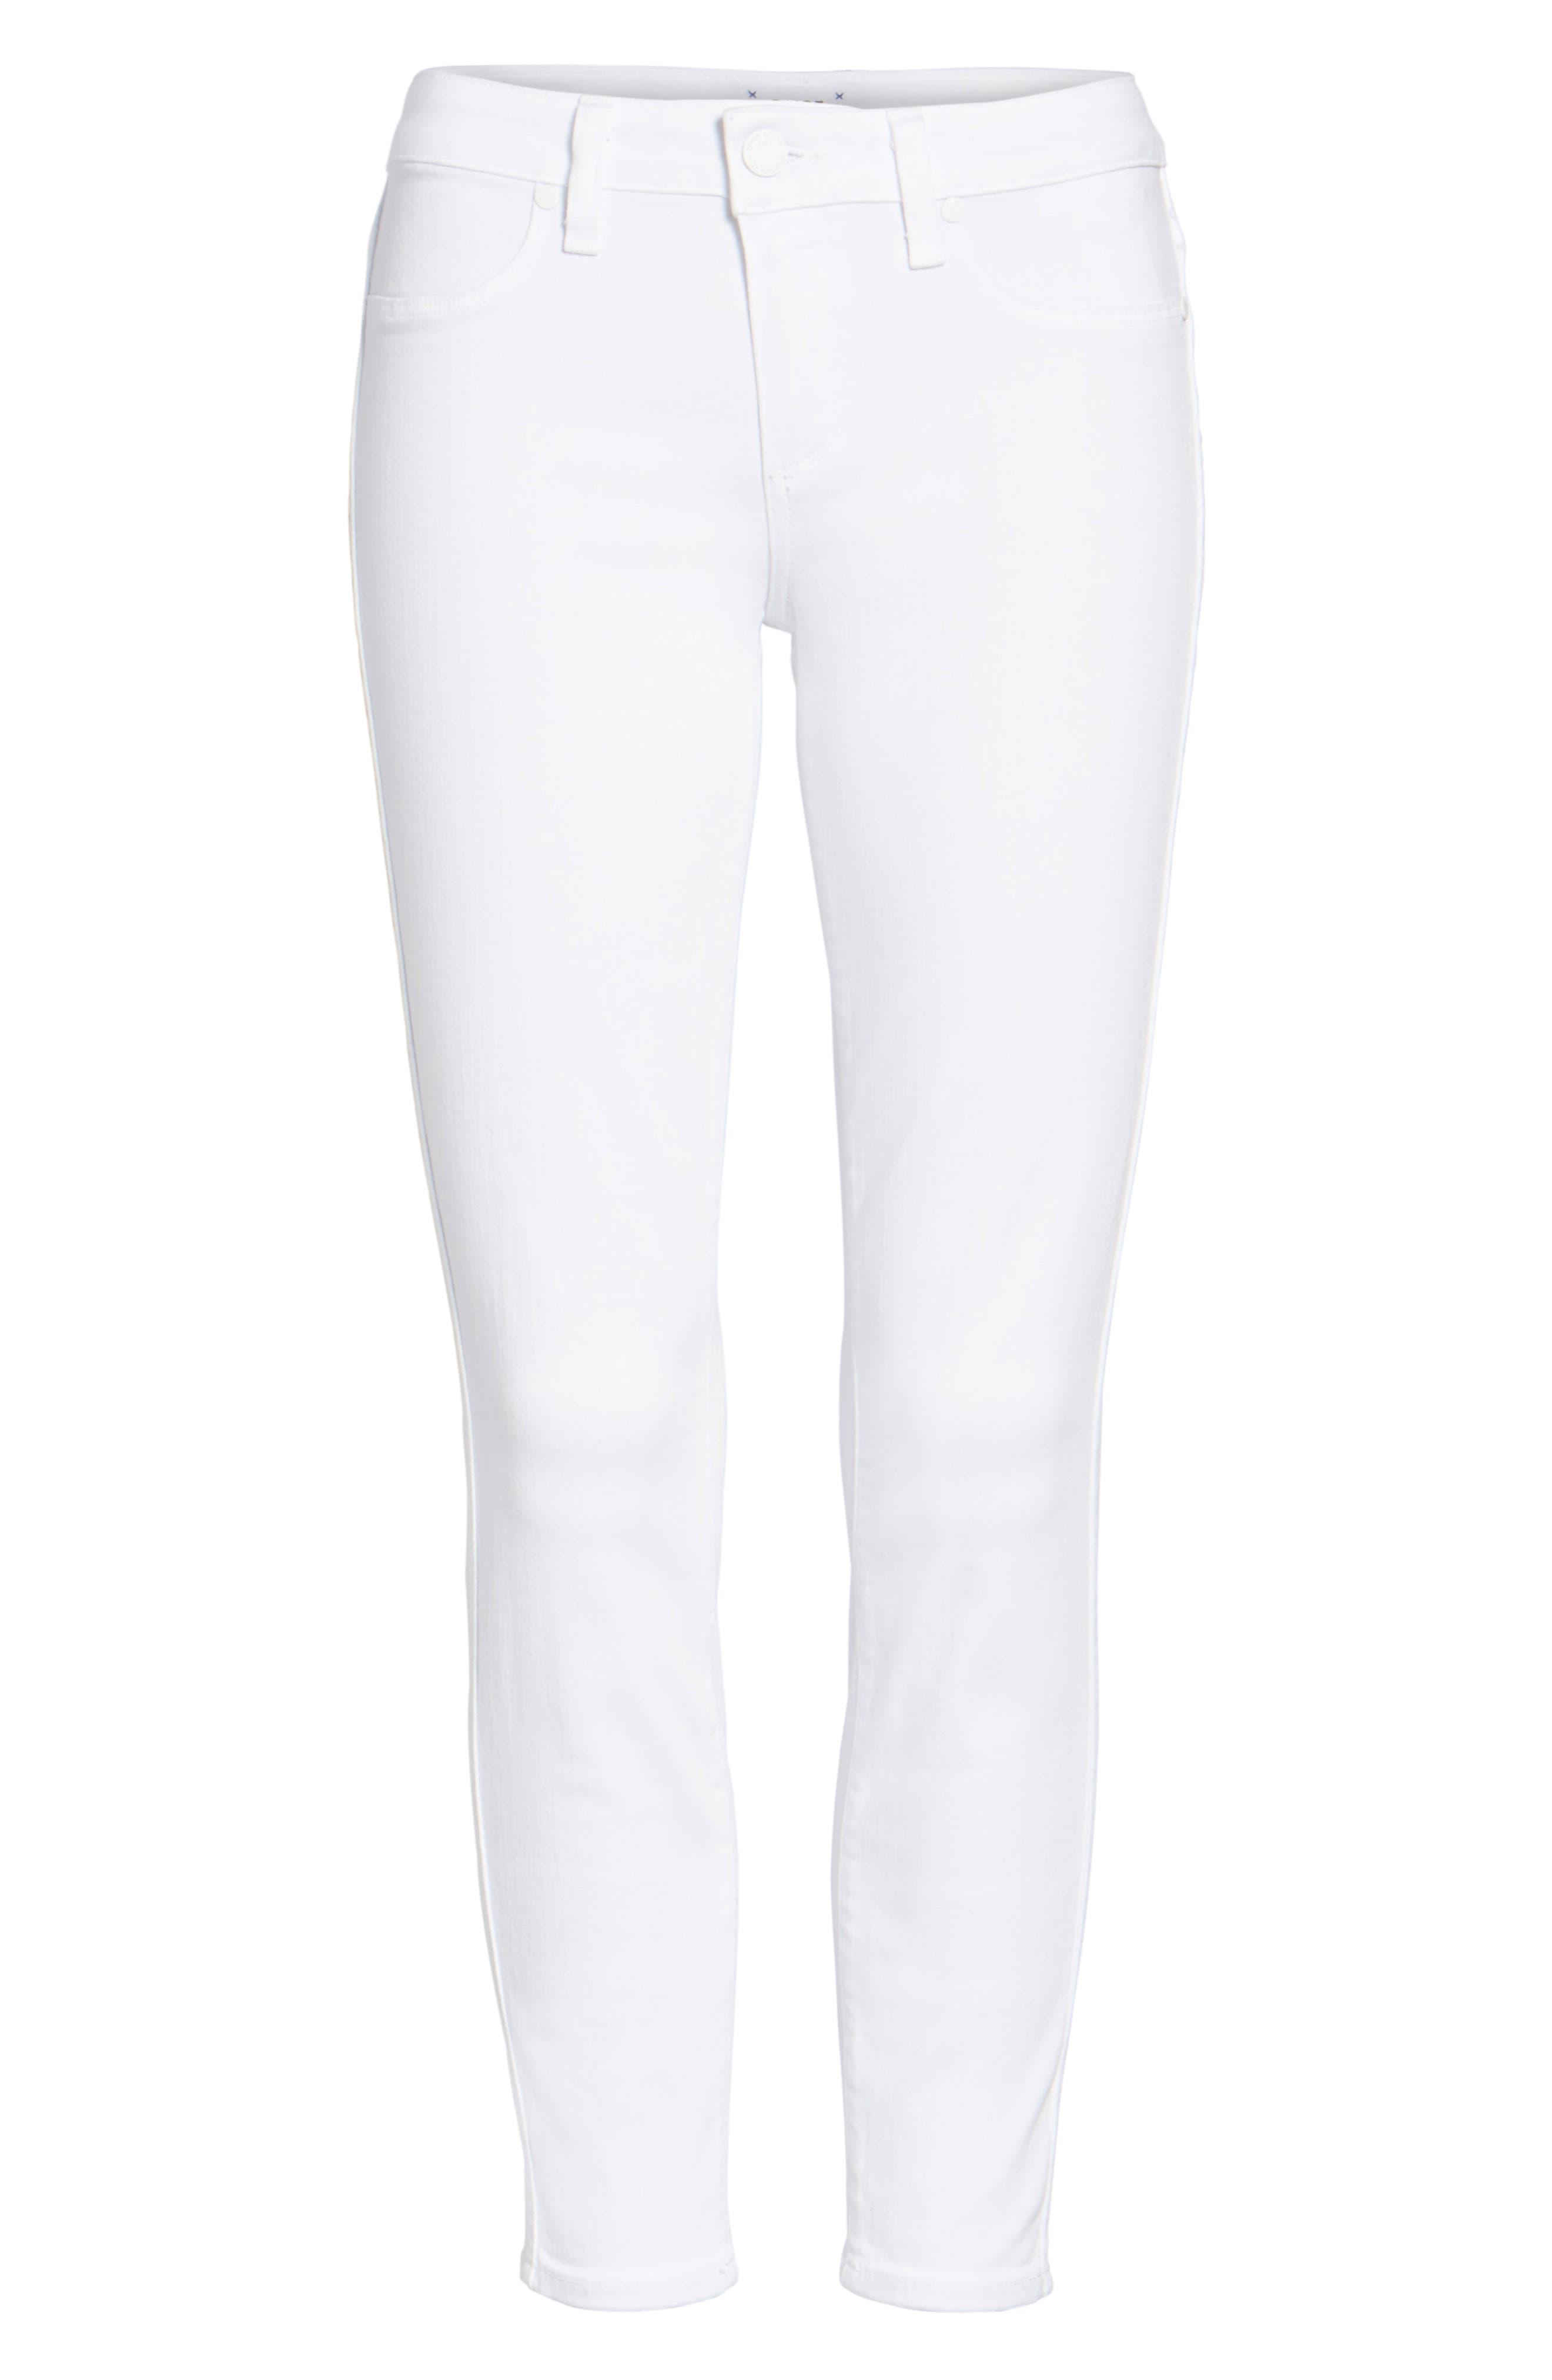 'Verdugo' Crop Skinny Jeans,                             Alternate thumbnail 2, color,                             ULTRA WHITE